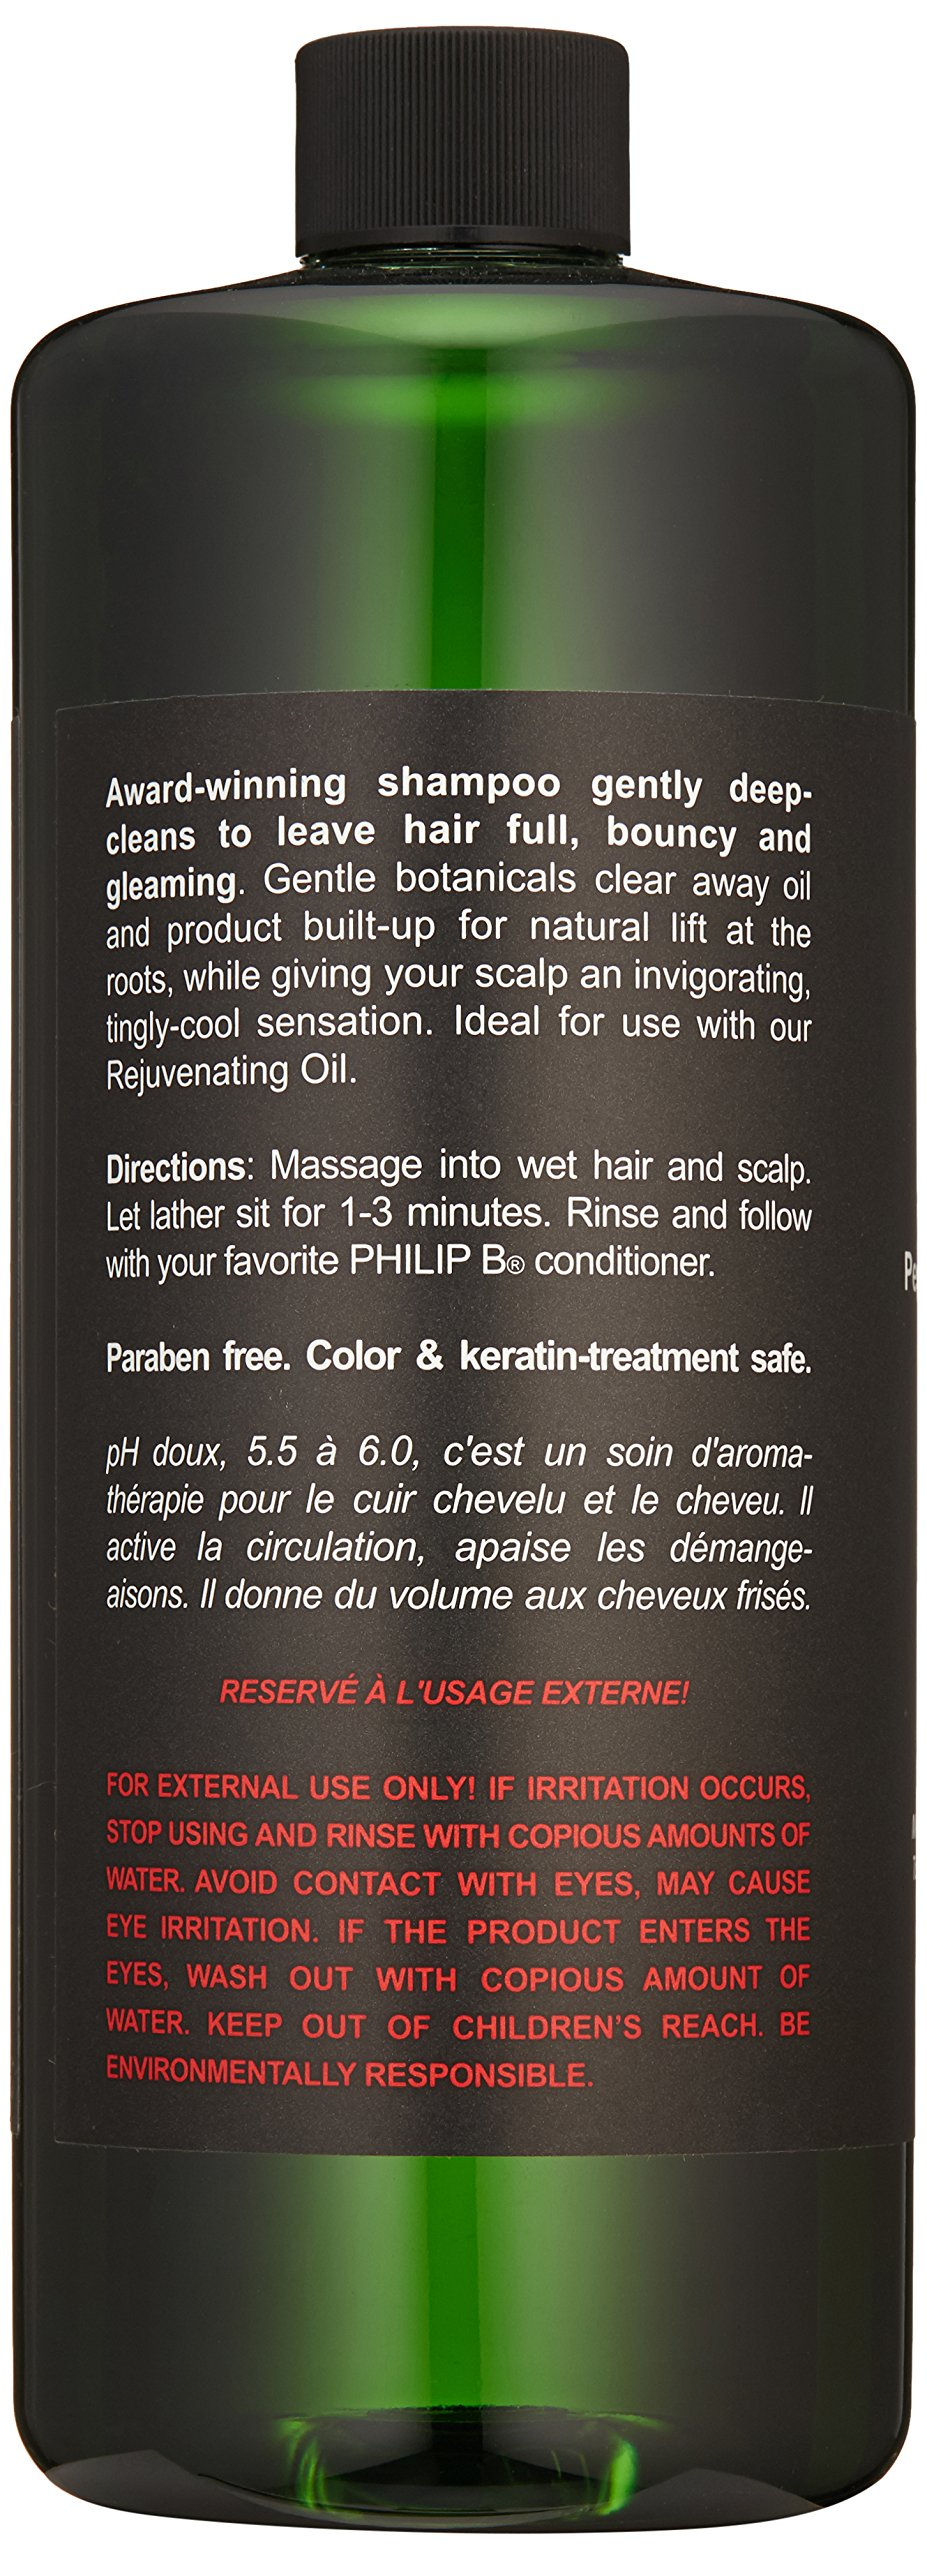 PHILIP B Volumizing and Clarifying Shampoo, Peppermint/Avocado, 32 Fl Oz by PHILIP B (Image #2)